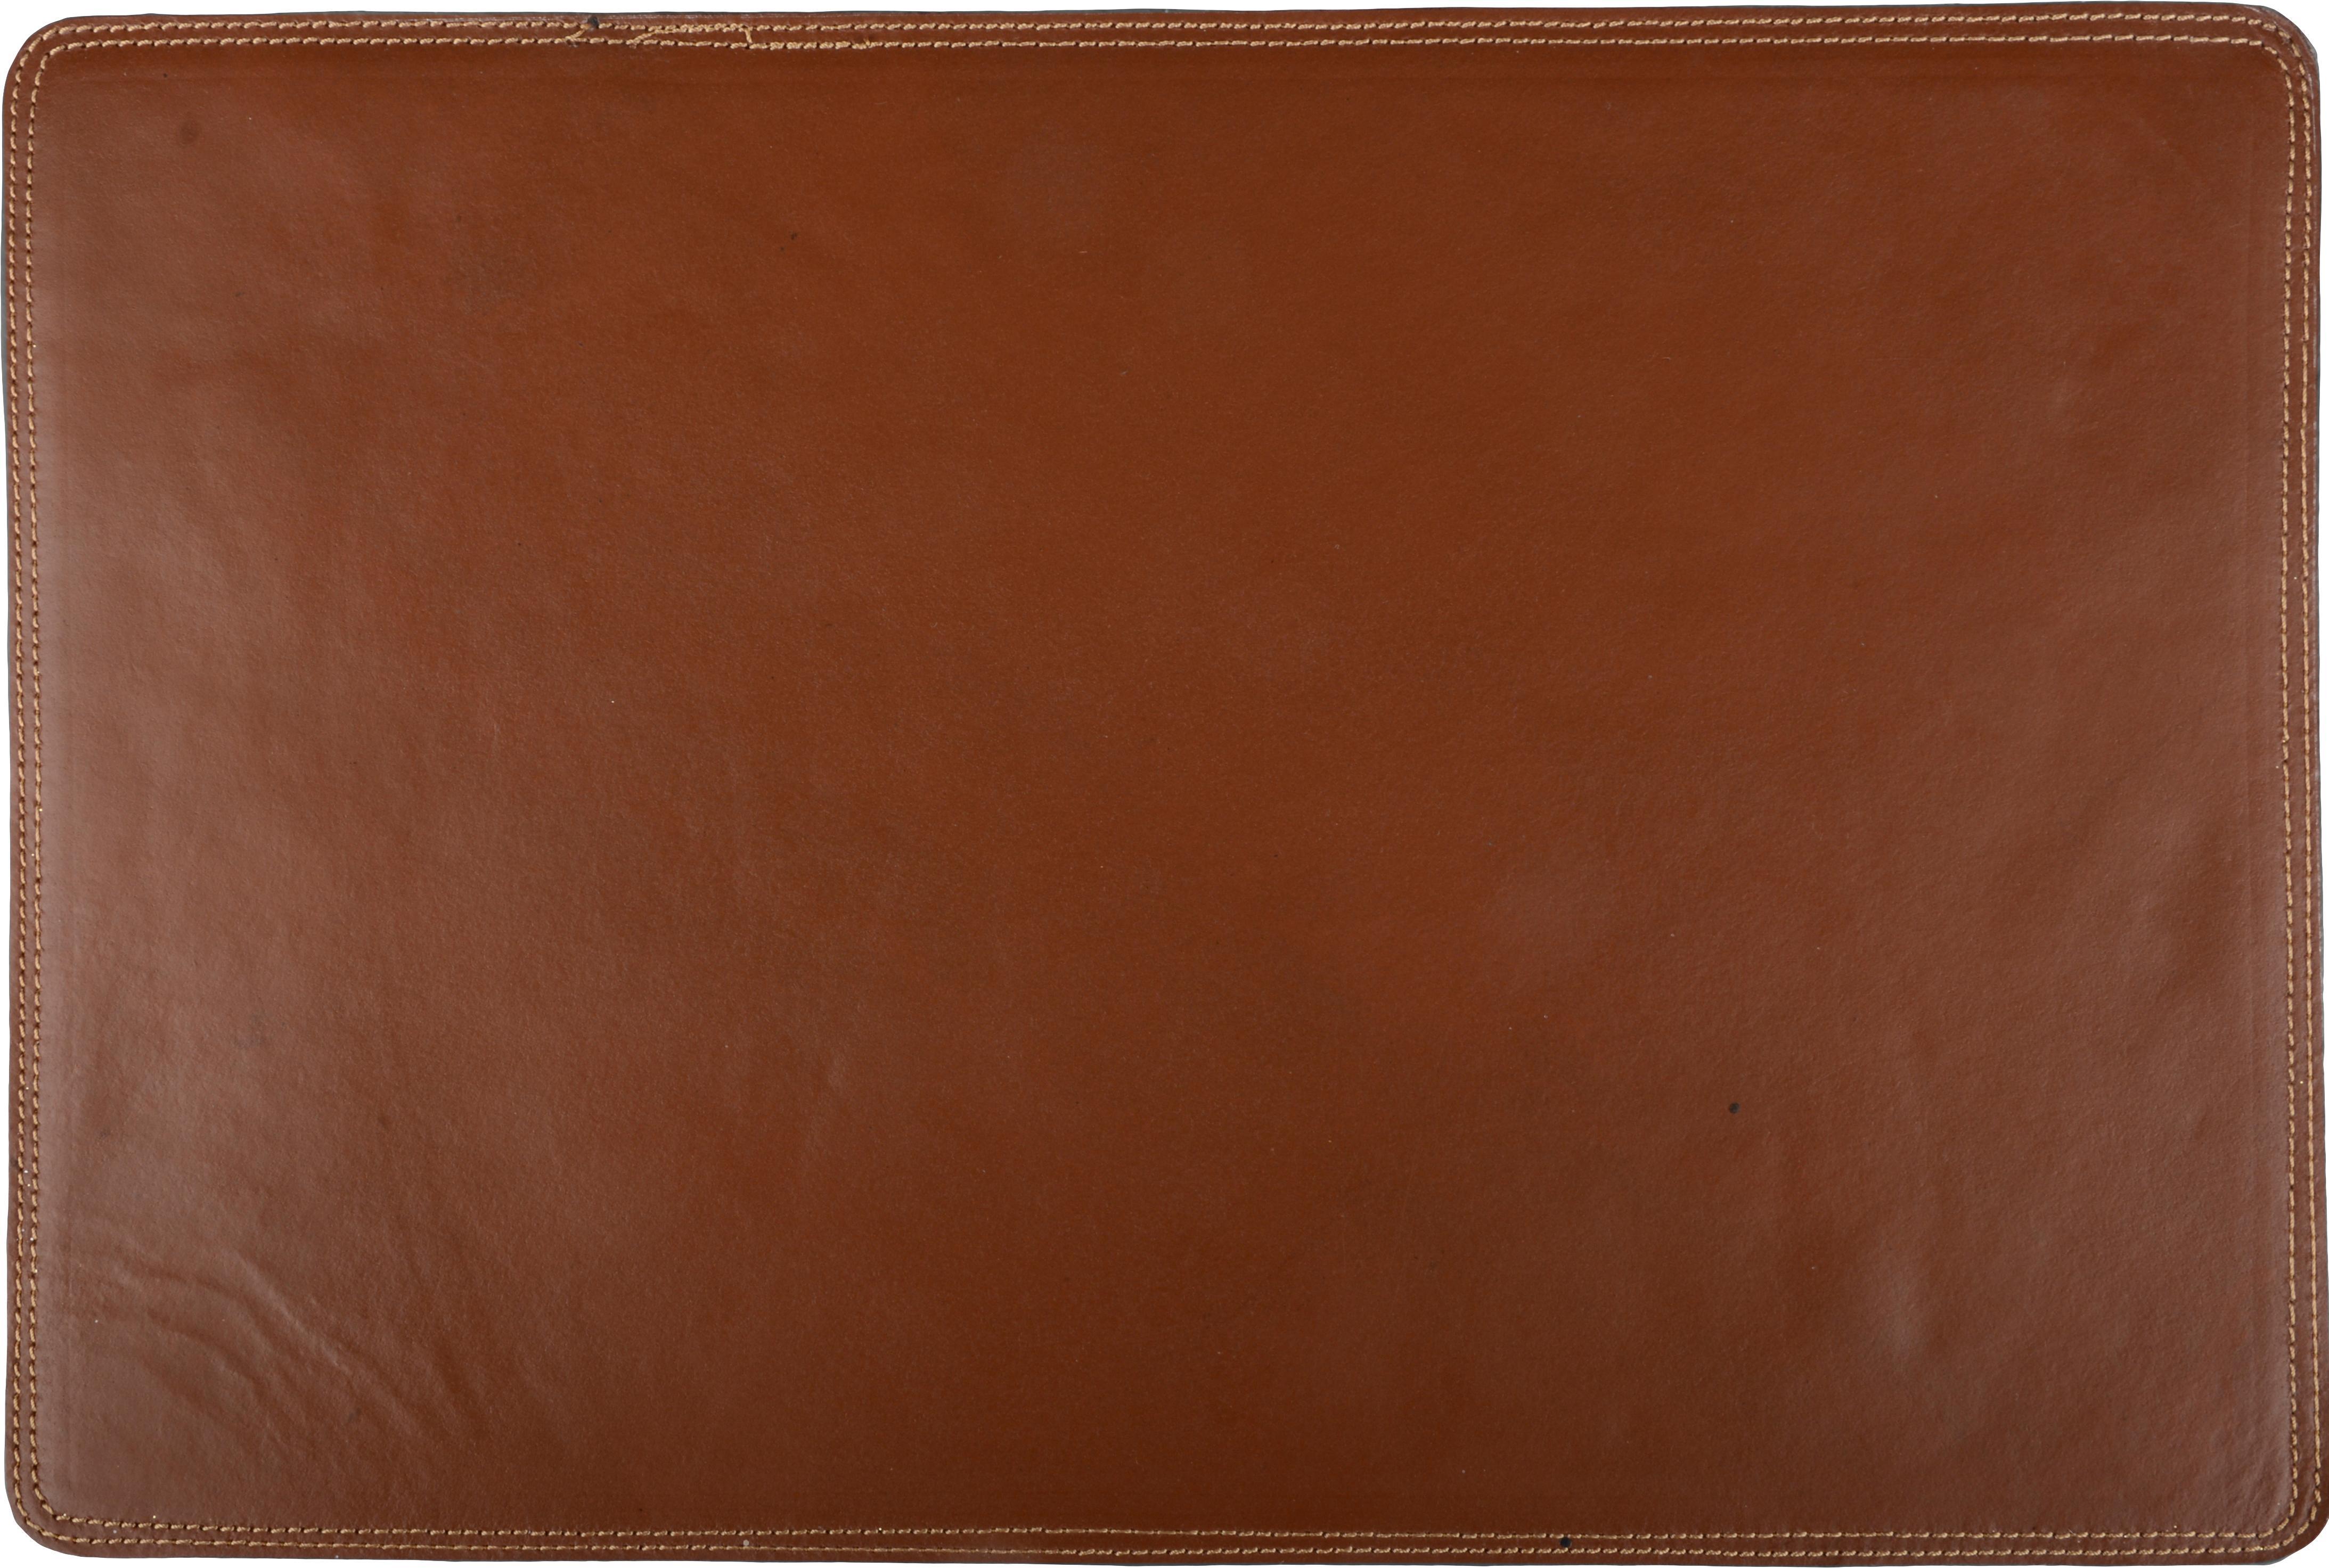 Mantel individual de cuero sintético Buffalo, Cuero sintético, Coñac, An 30 x L 45 cm